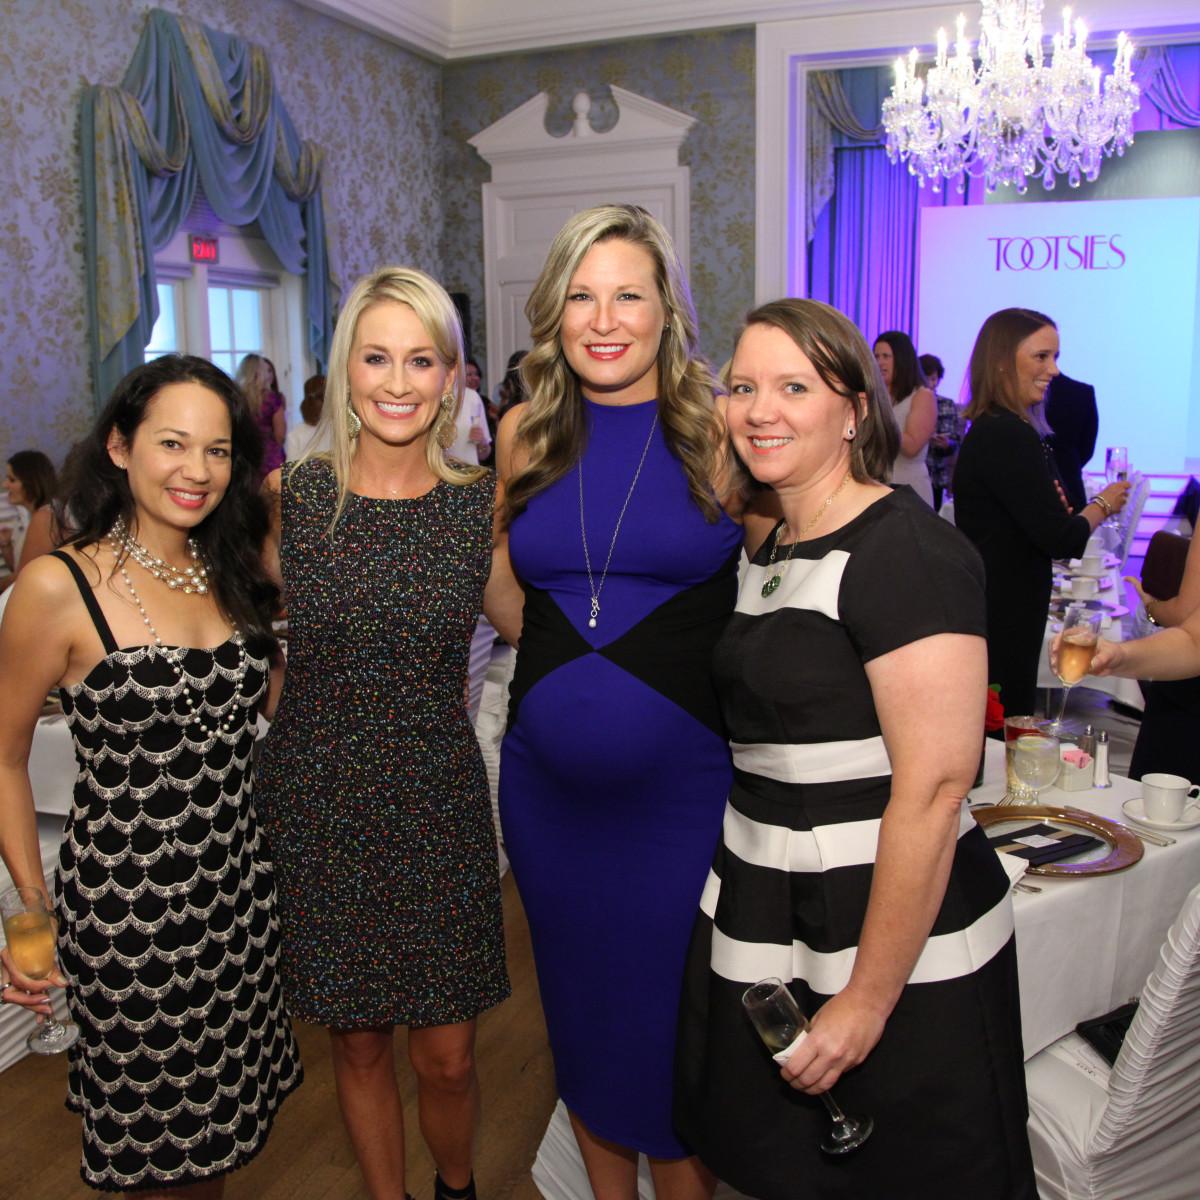 News, Shelby, Junior League Luncheon, Sept. 2015, Cherish Bradshaw, Amy Dunn, Bethany Buchanan, Katie Hackerdorn